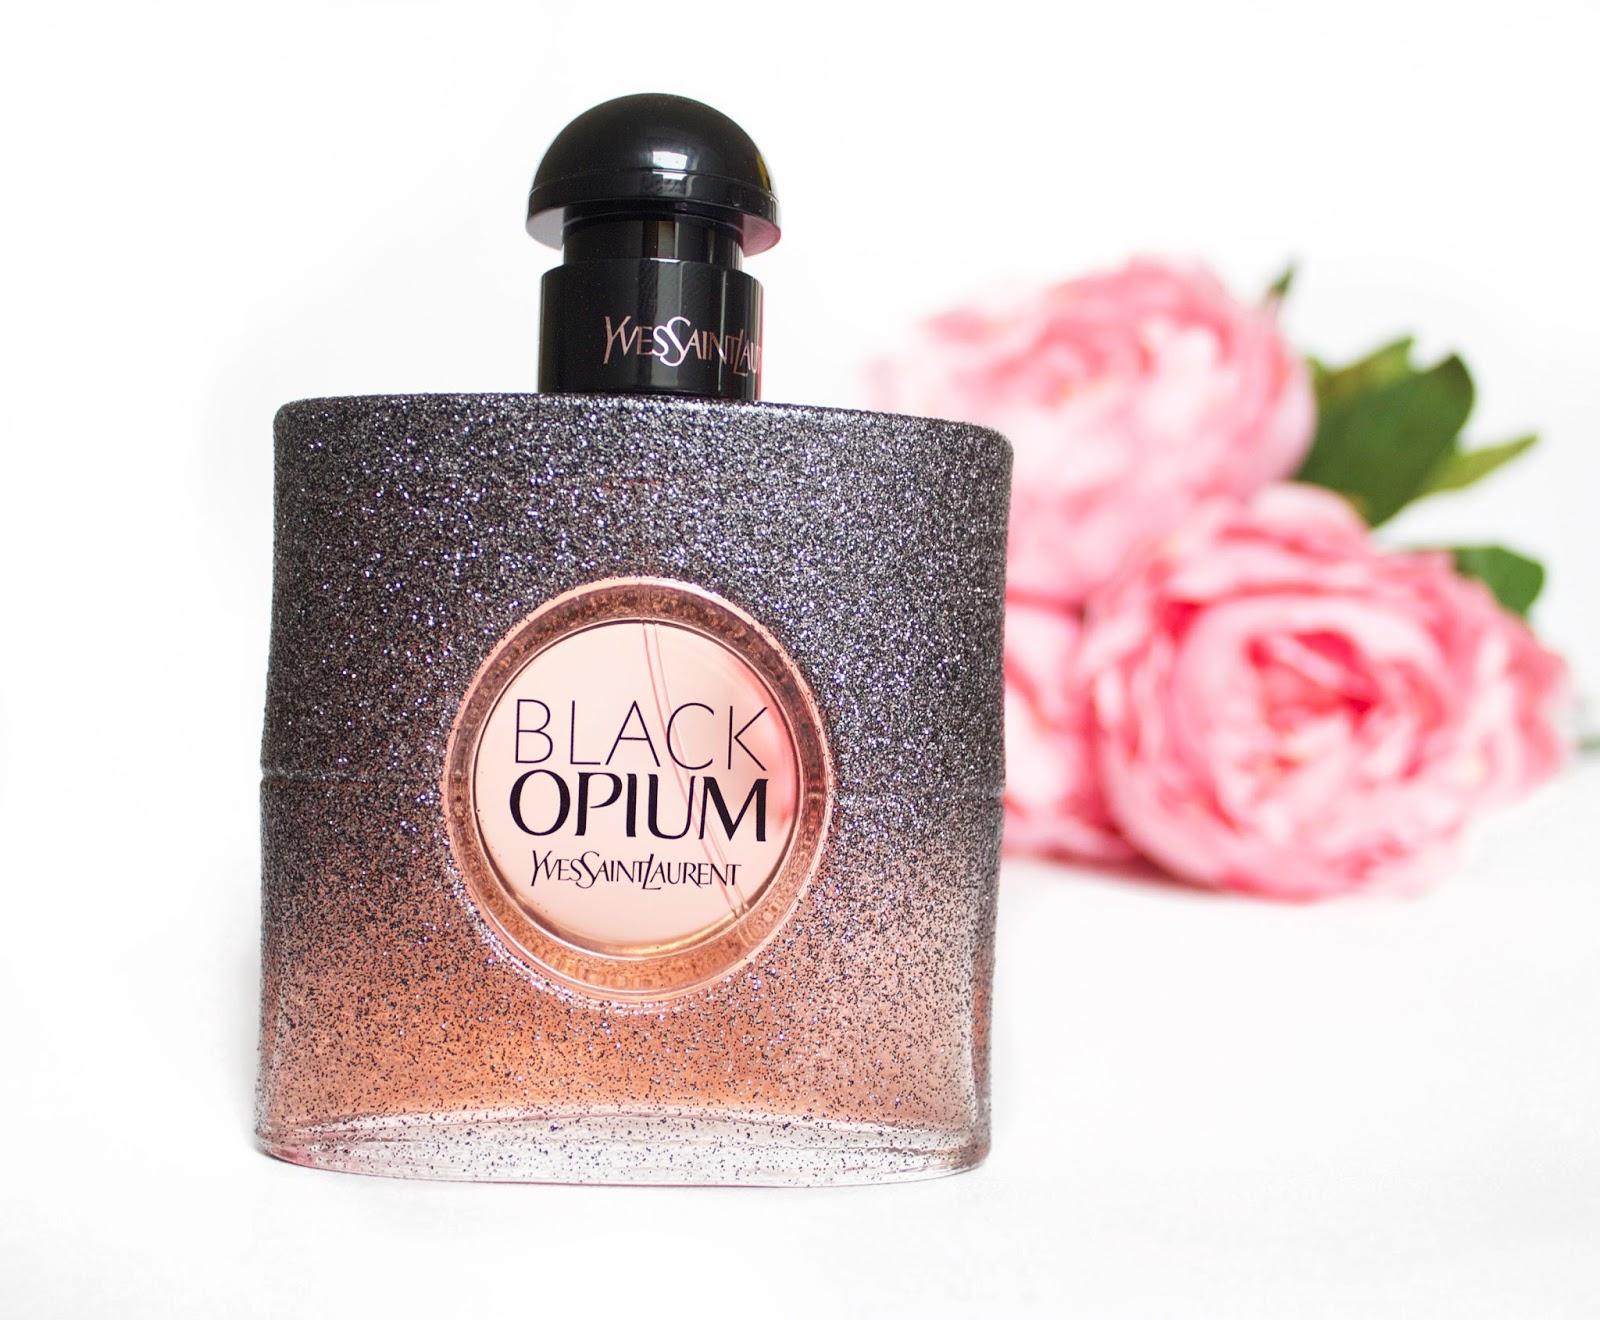 Ysl Black Opium Floral Shock Perfume Live Laugh Lipstick